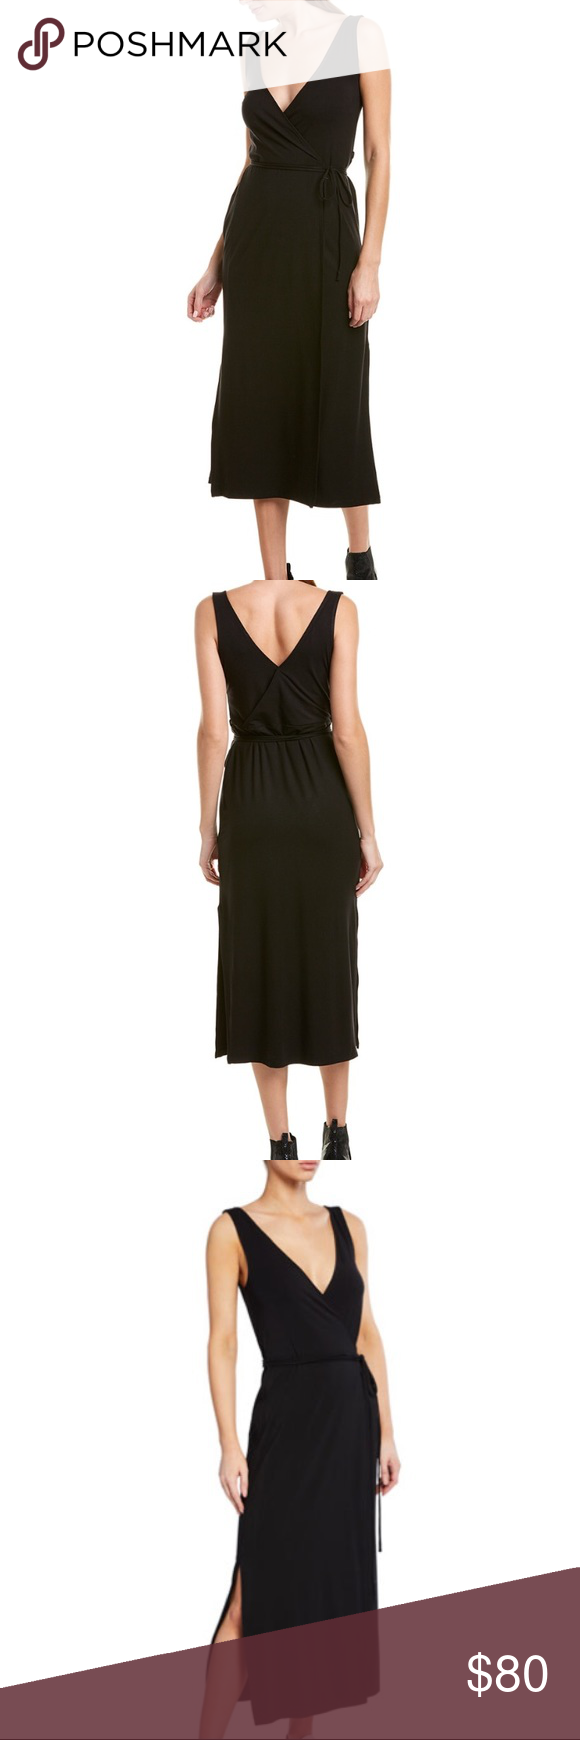 Vince Black Sleeveless Wrap Maxi Dress Nwt Xs In 2020 Maxi Wrap Dress Maxi Dress Casual Chic Style [ 1740 x 580 Pixel ]